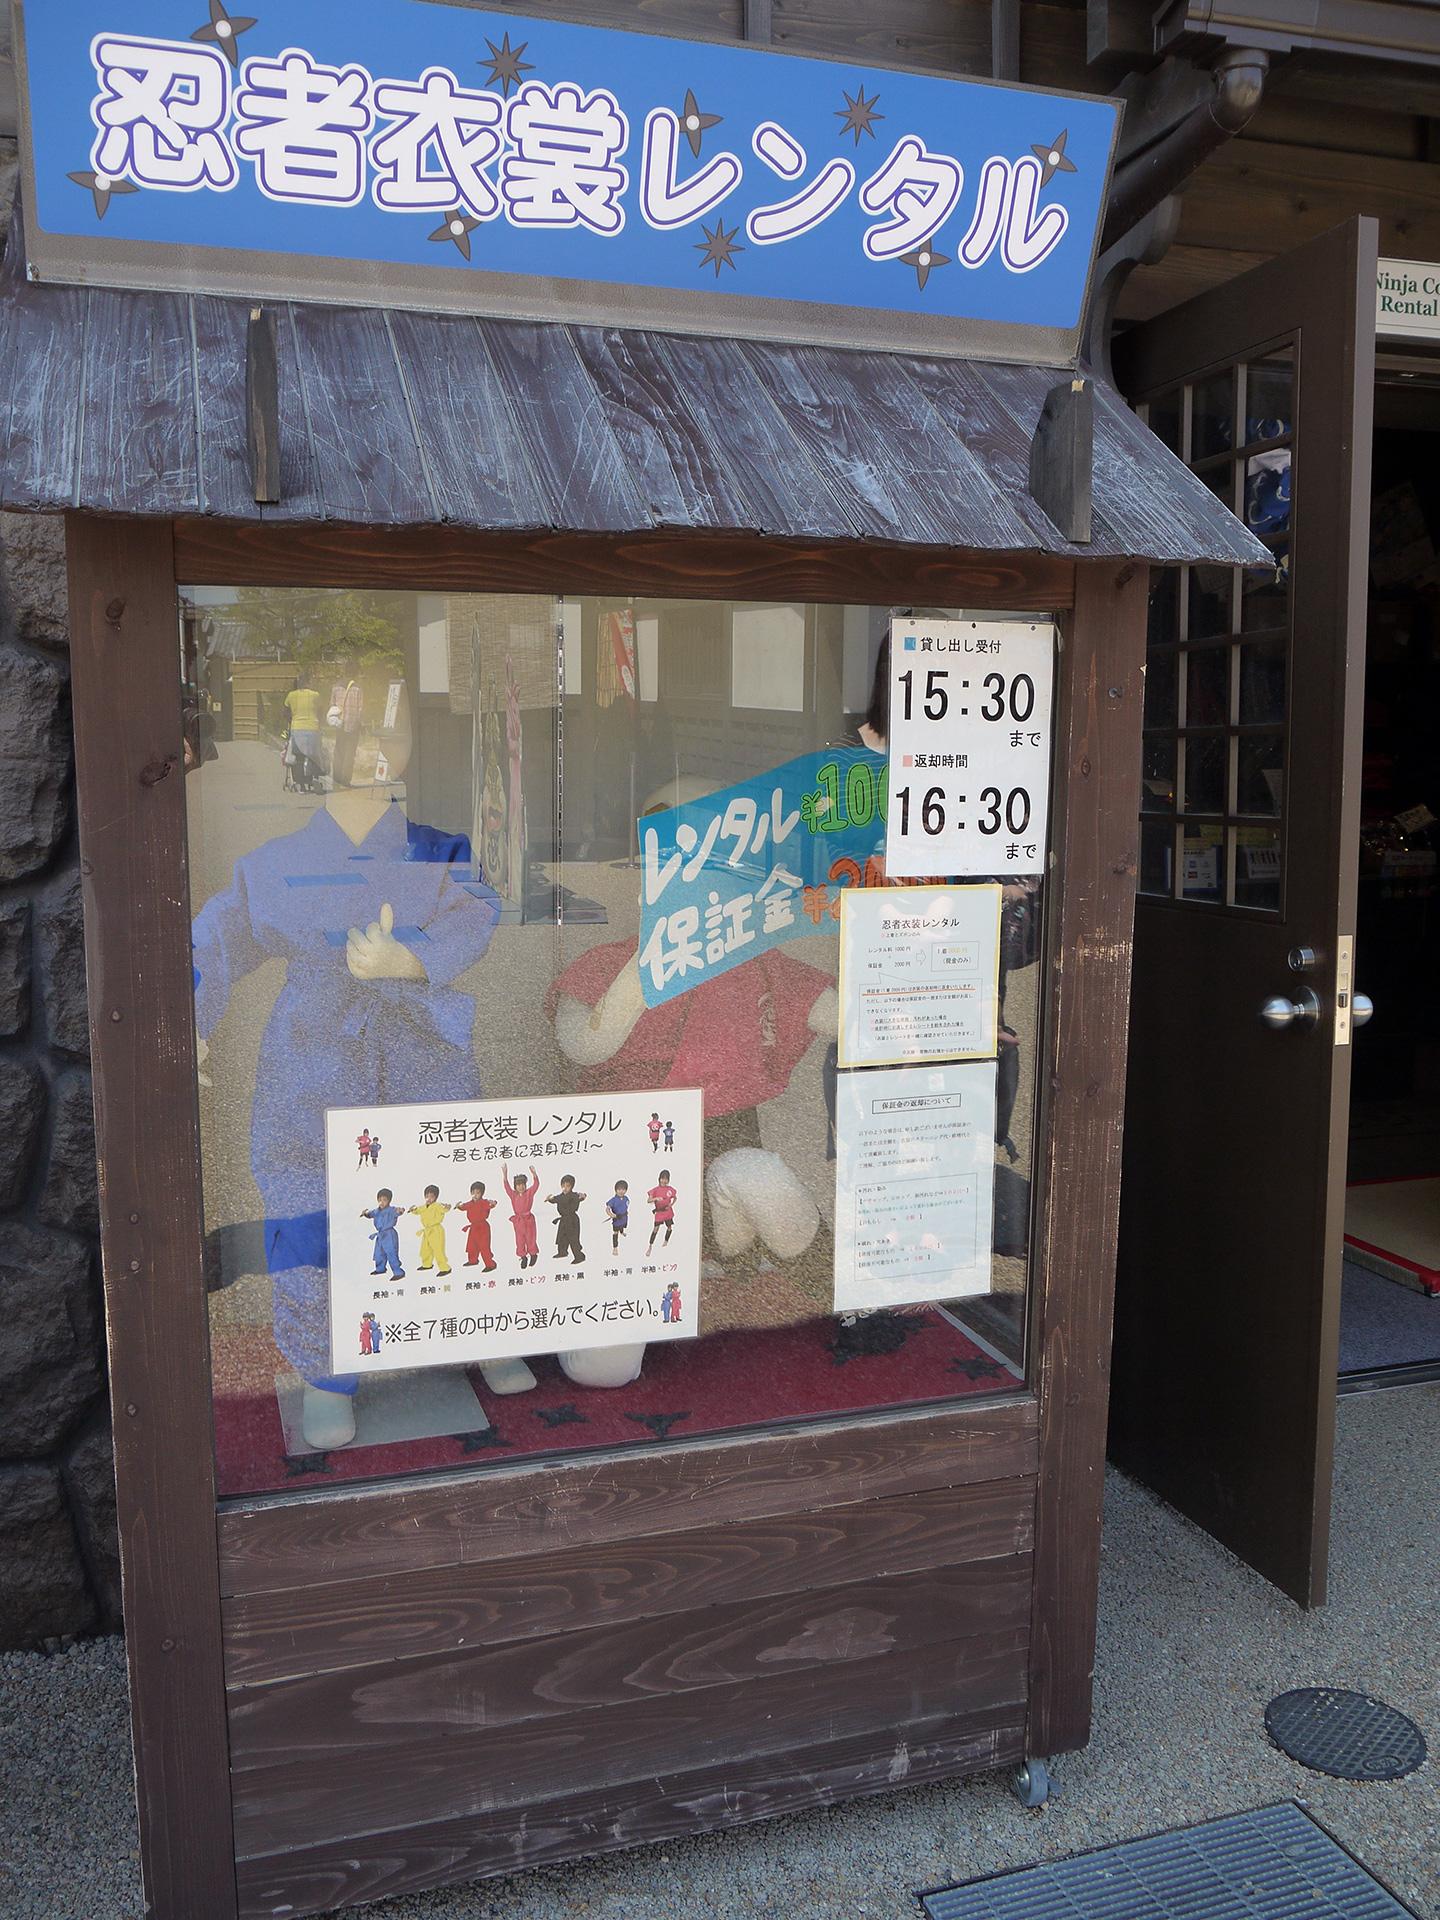 ninja outfit rental kiosk